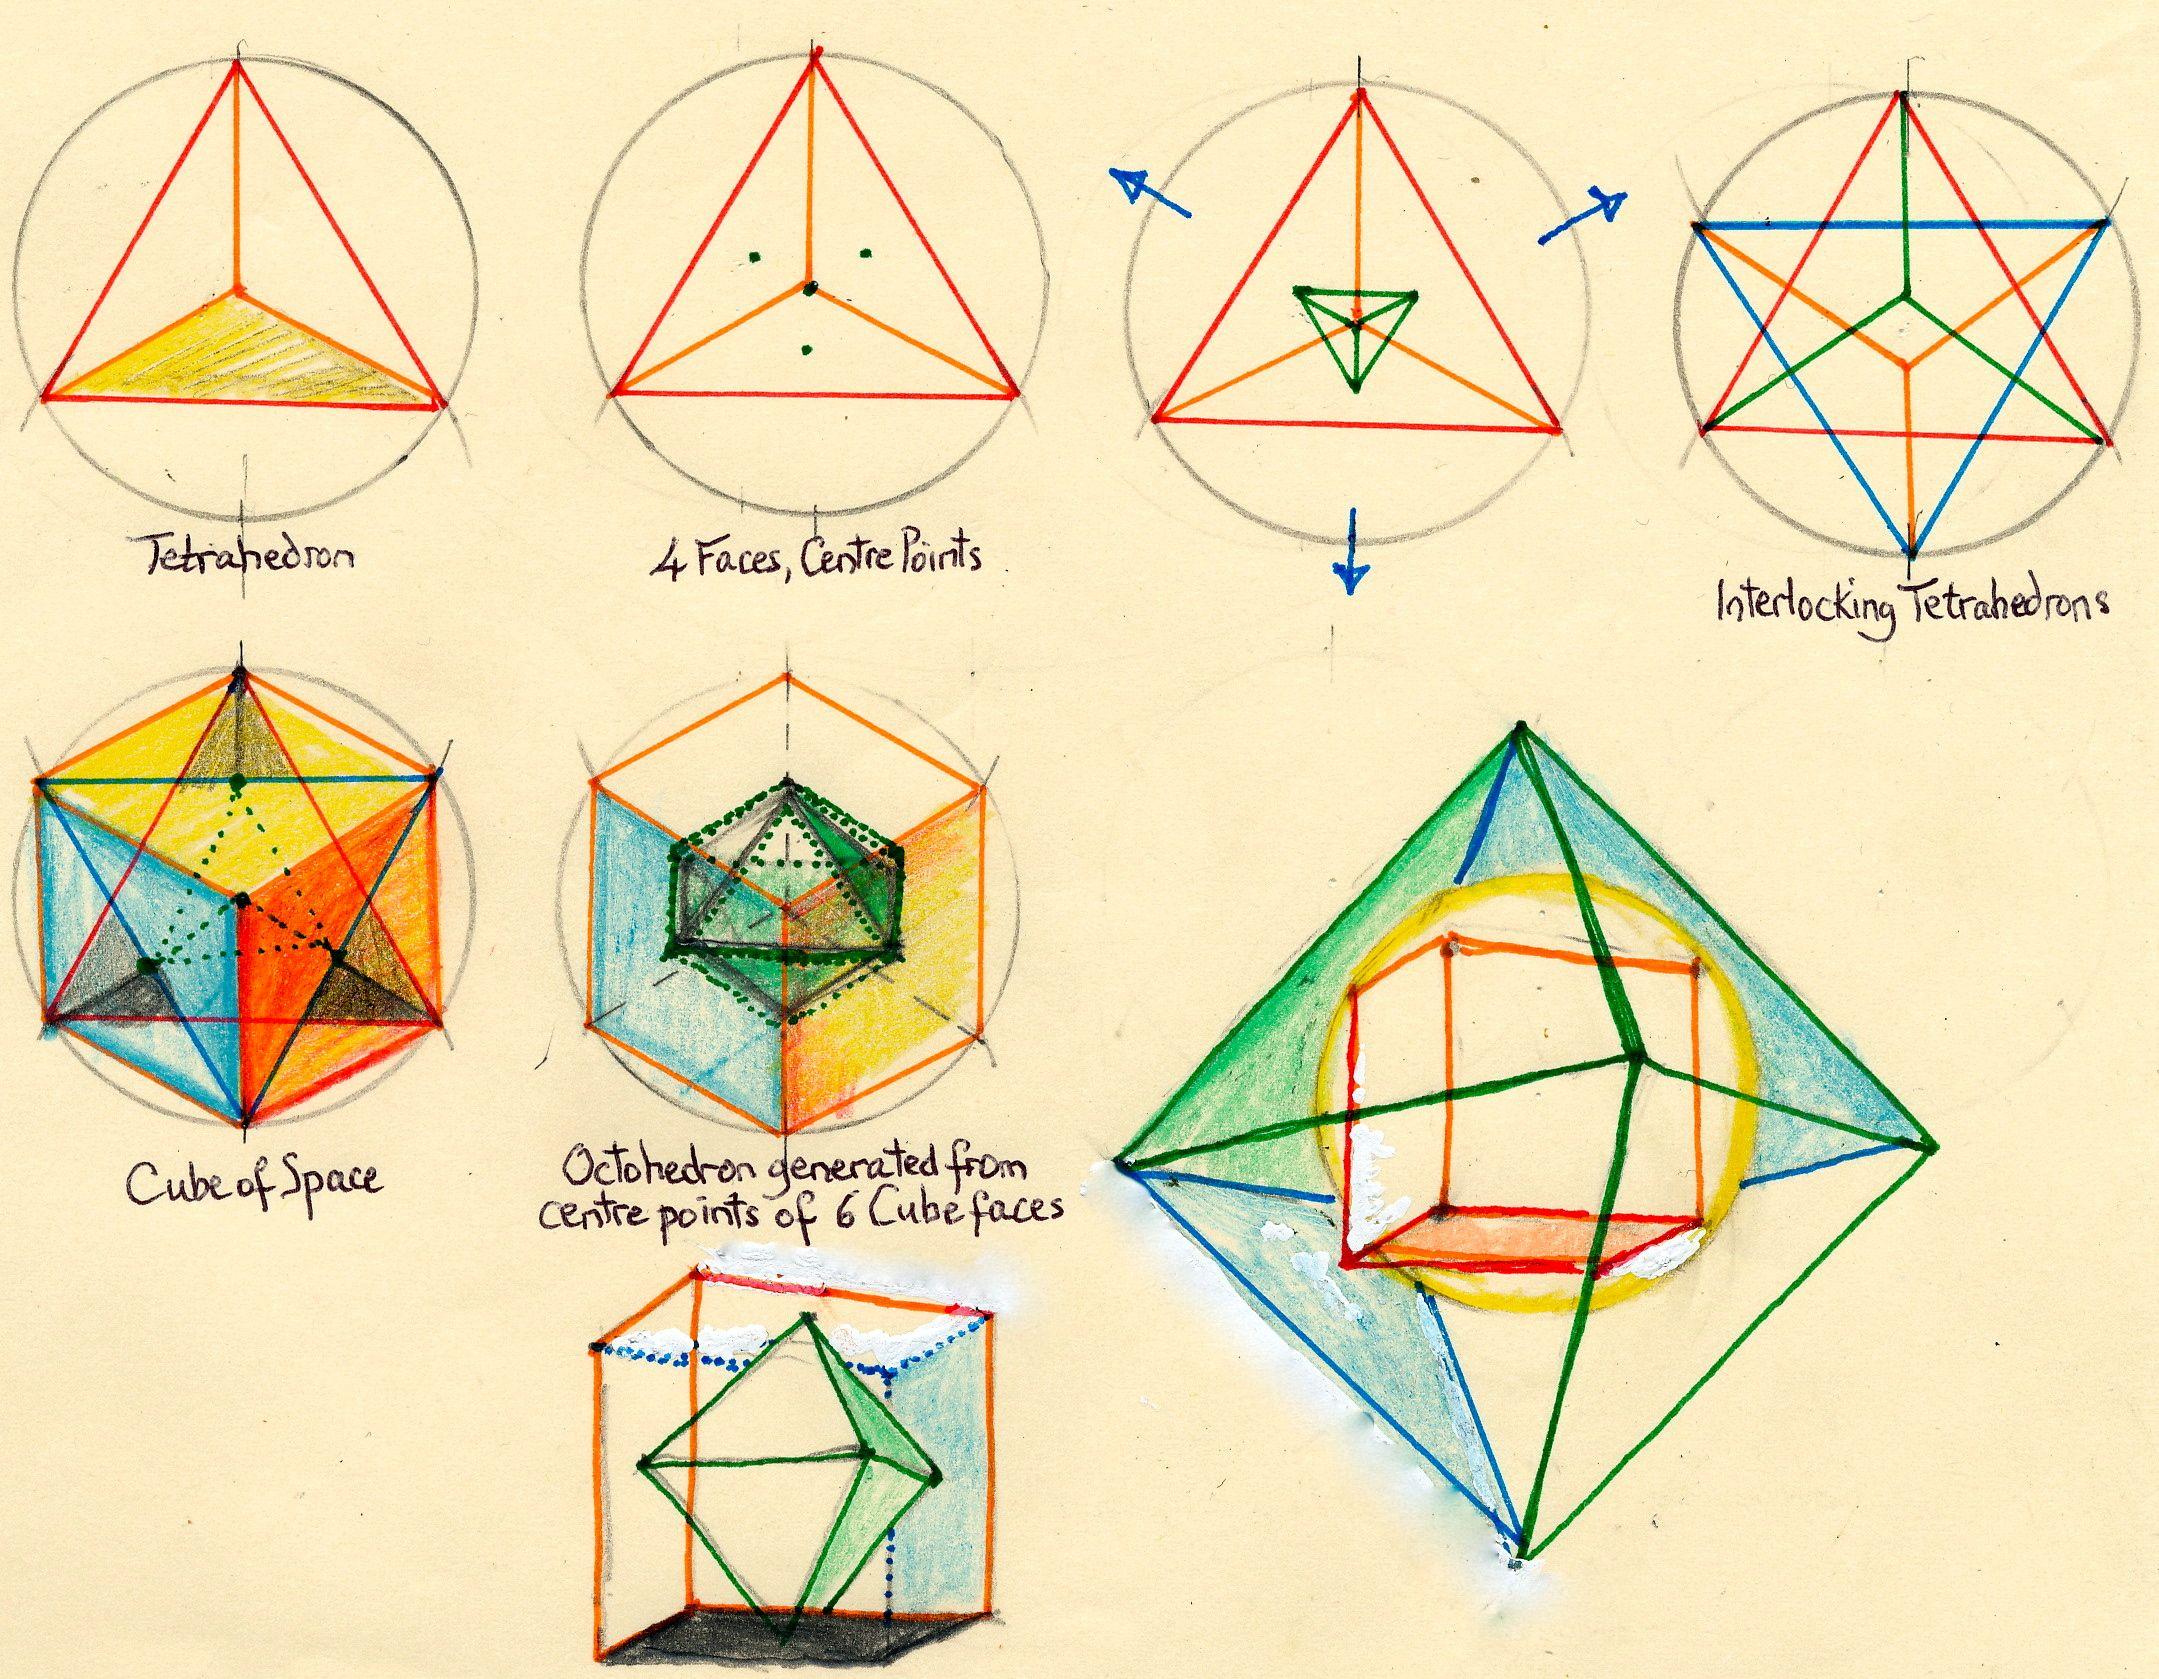 Doodle 2 Tetrahedron Octahedron Sequence Octahedron Doodle 2 Doodles [ 1679 x 2159 Pixel ]